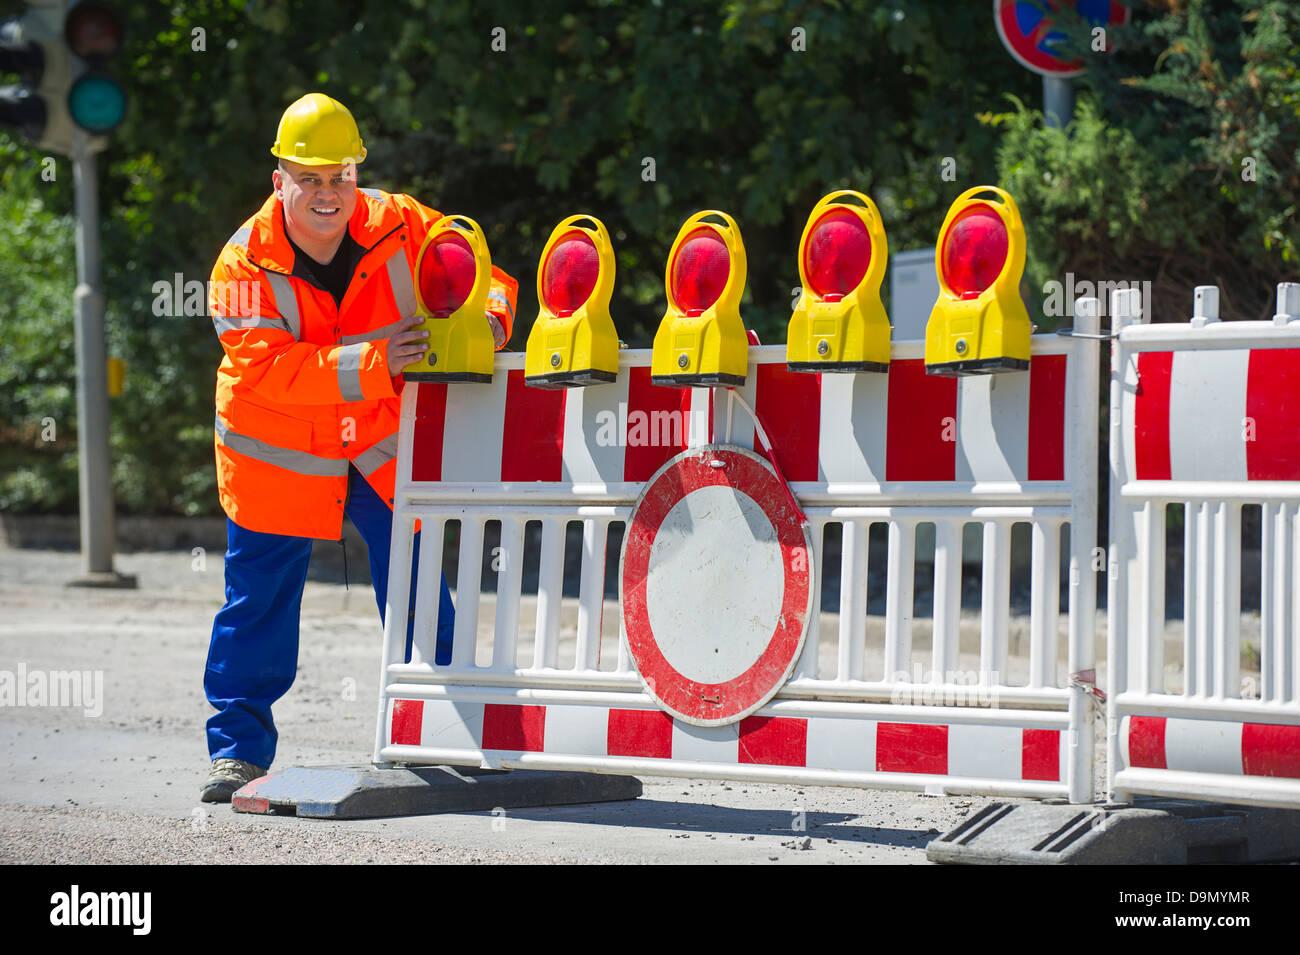 (Model release) Worker checks the building site roadblock - Stock Image